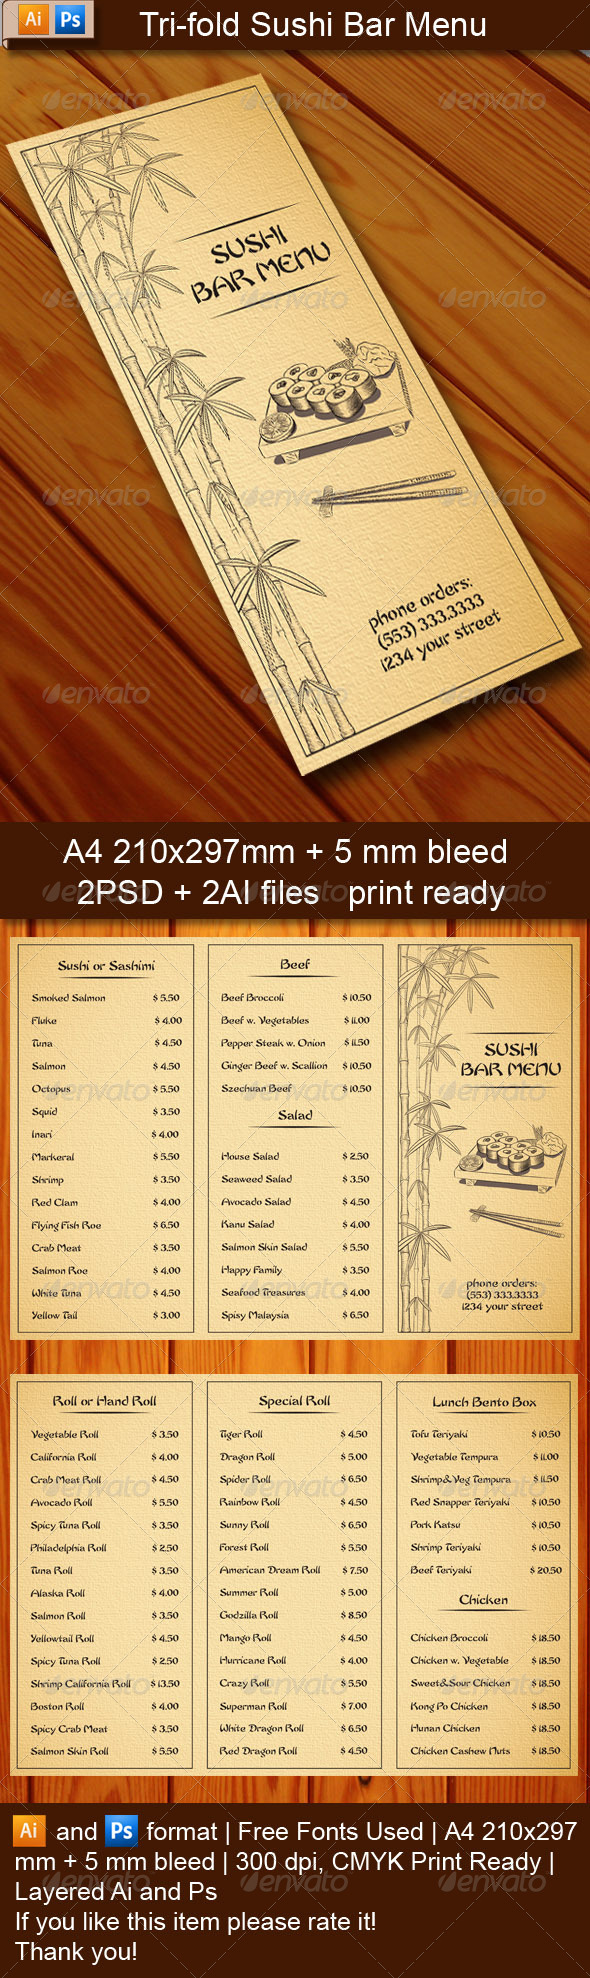 tri fold sushi bar menu template graphicriver. Black Bedroom Furniture Sets. Home Design Ideas